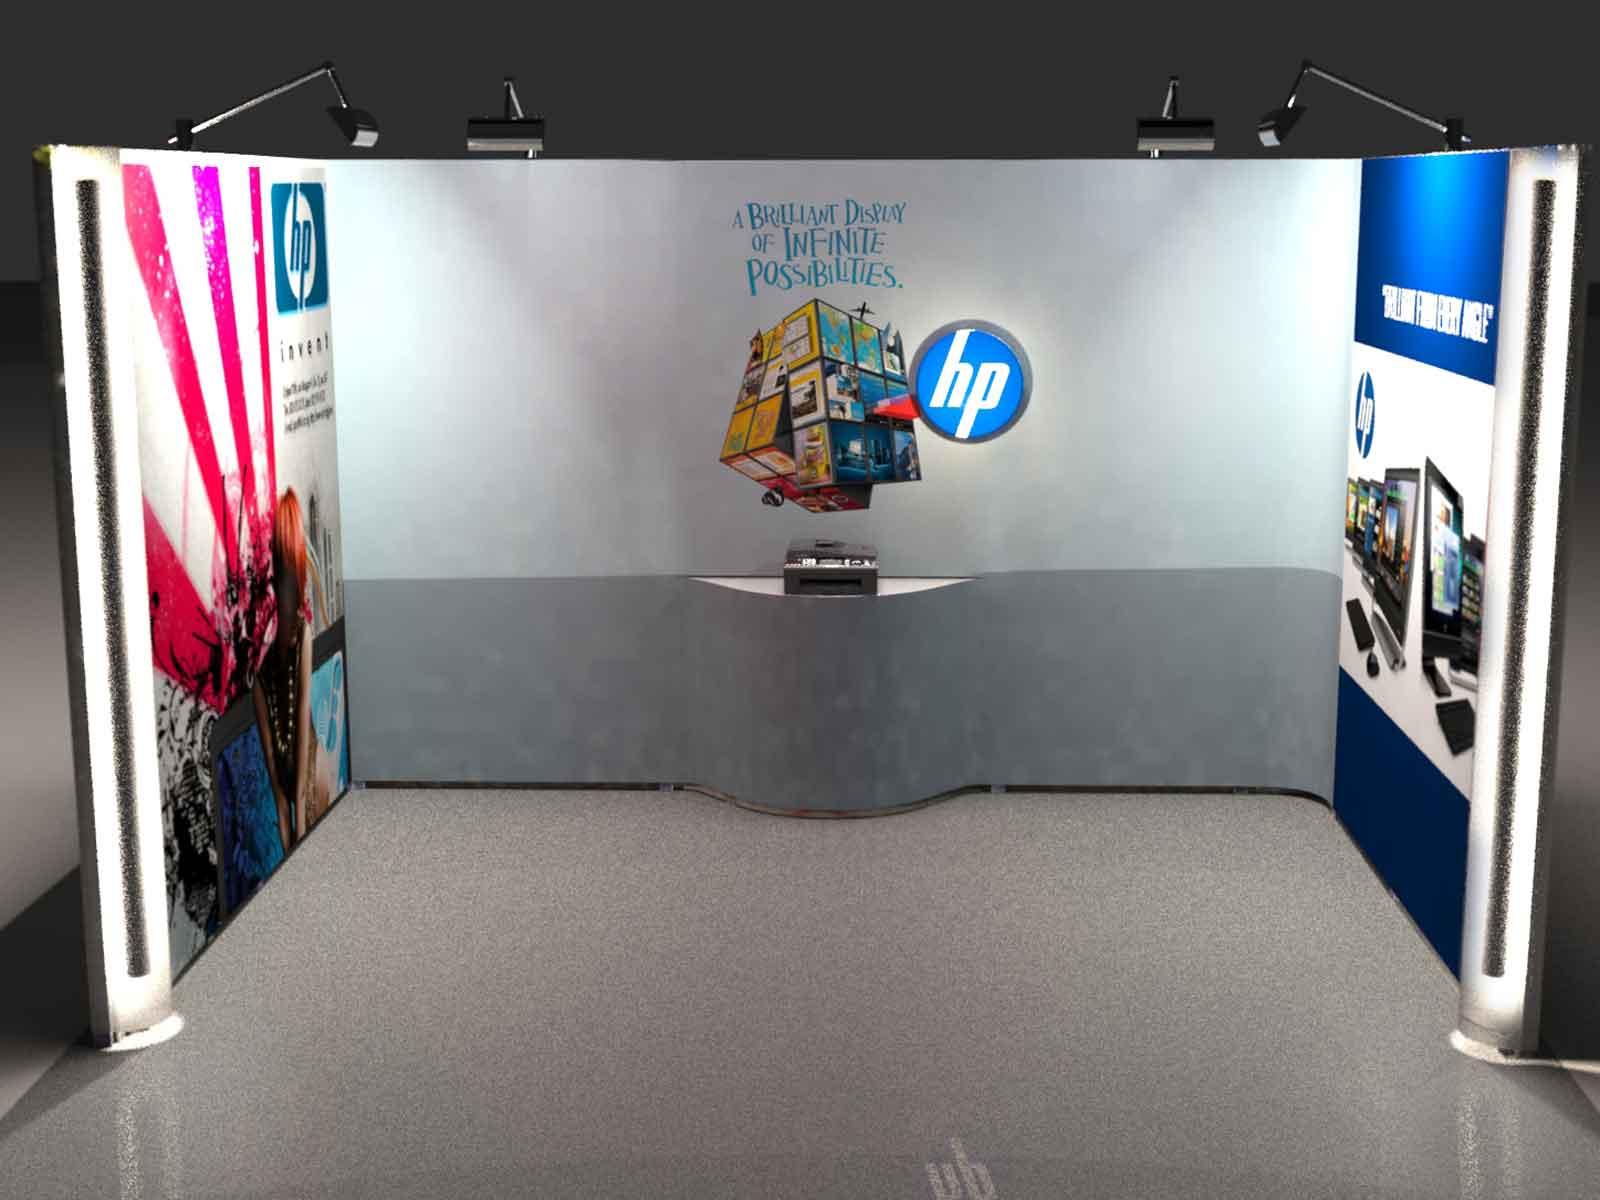 Exhibition Shell Scheme Graphics : Shell scheme graphics enhance plain exhibition backdrops